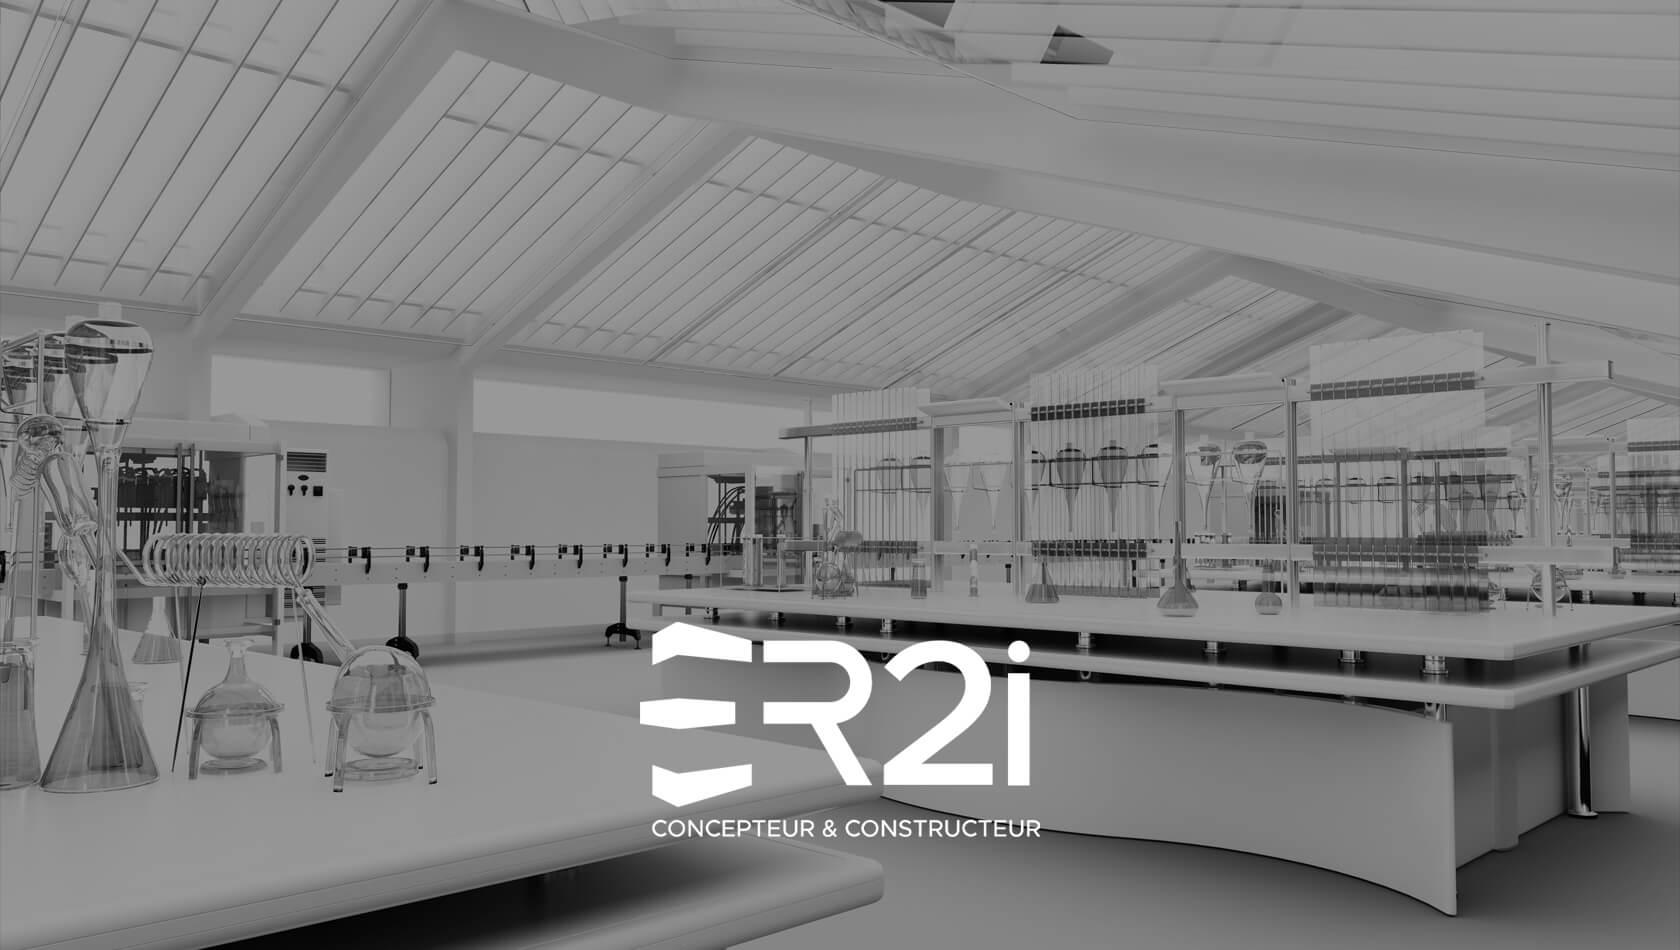 ER2I change de look avec FX